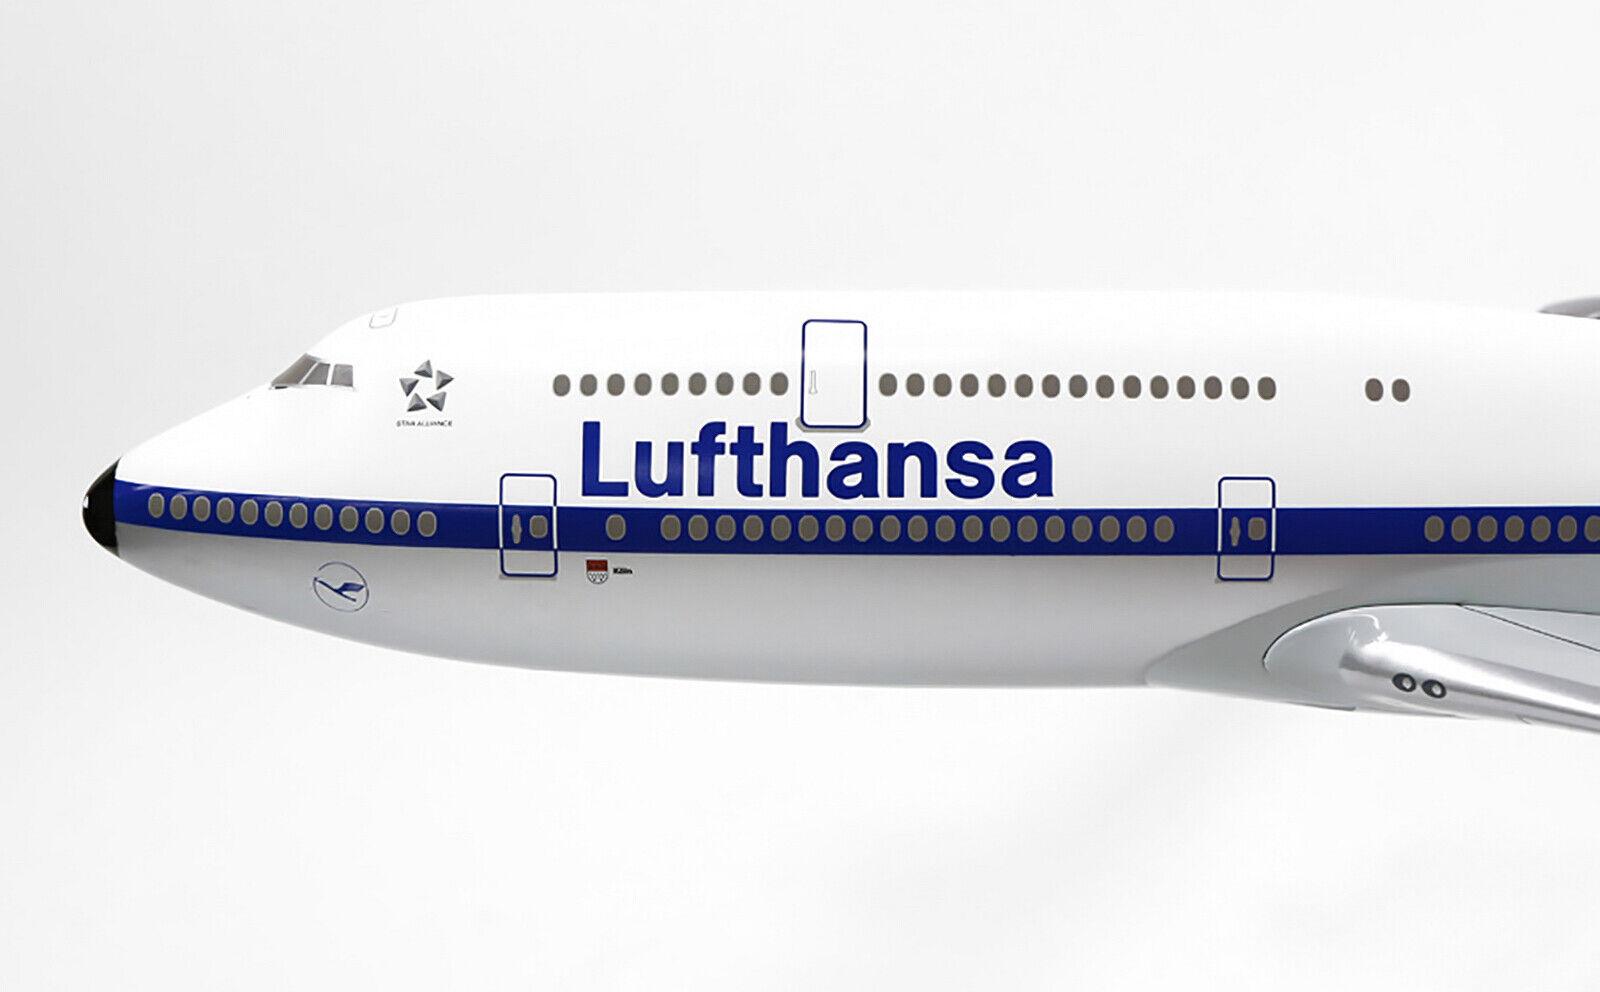 Lufthansa Boeing 747-8 1:200 Limox Wings LW200DLH003 B748 D-ABYA New Livery LH